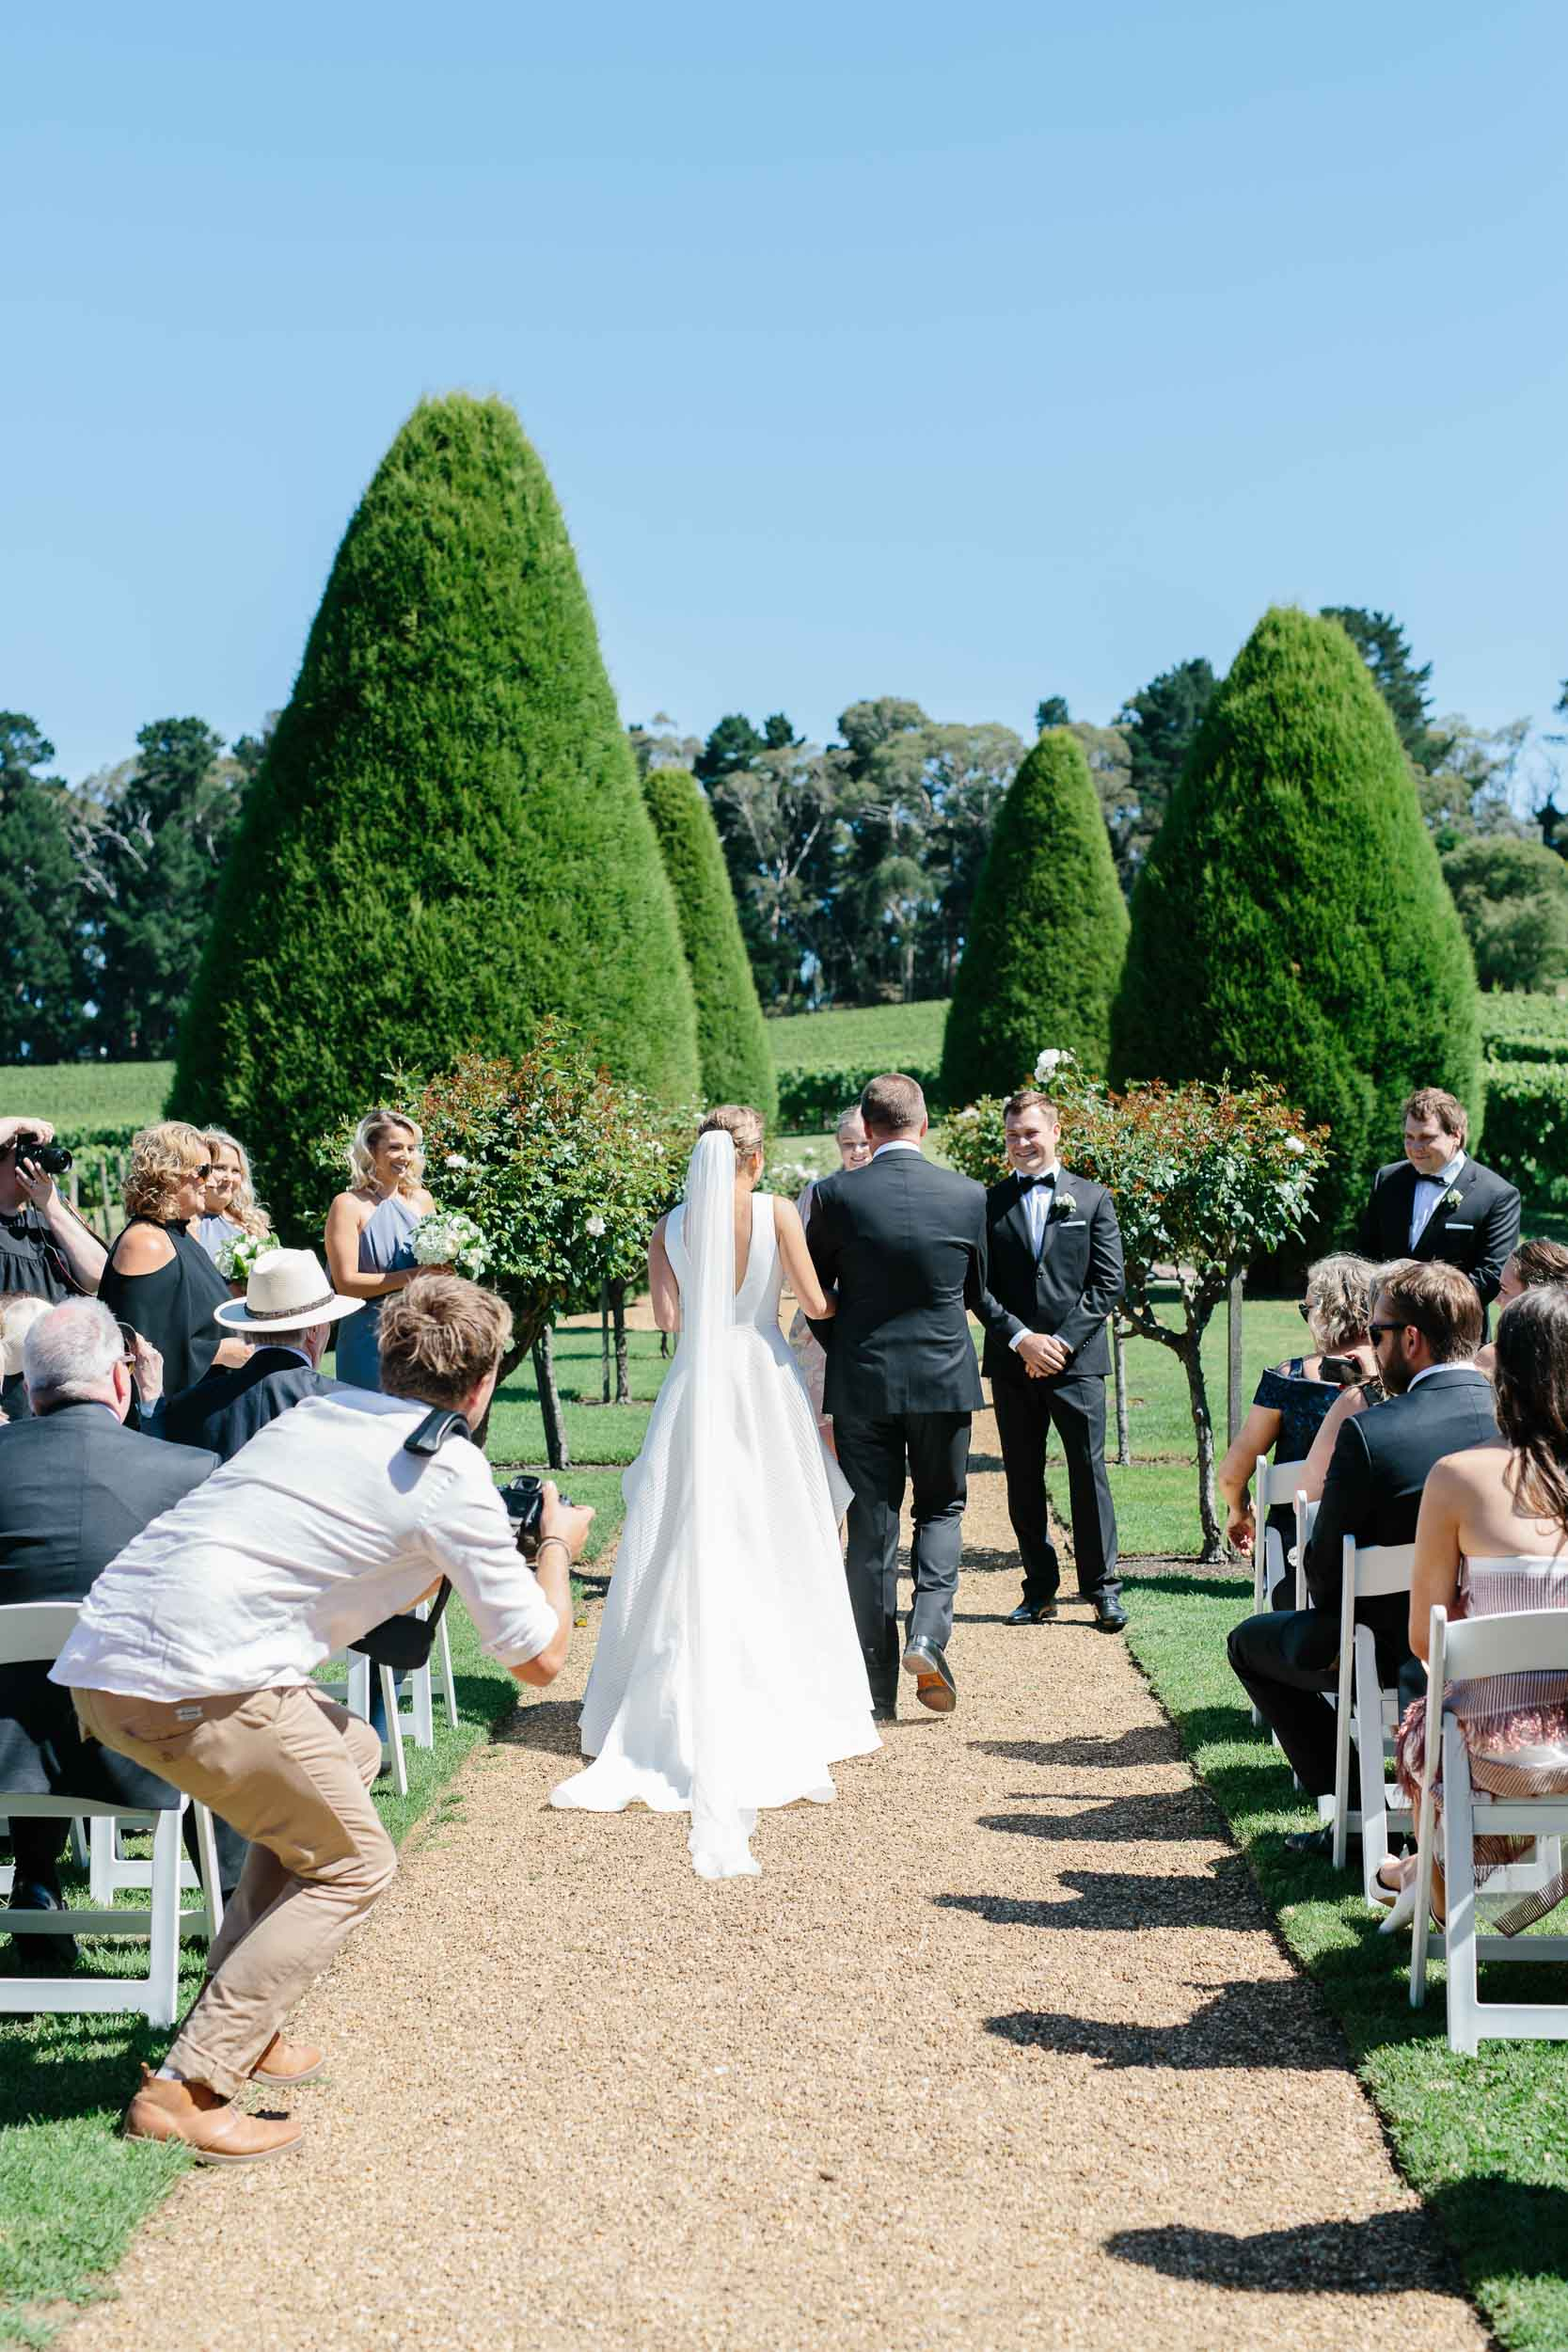 Kas-Richards-Mornington-Peninsula-Wedding-Lindenderry-Red-Hill-206.jpg